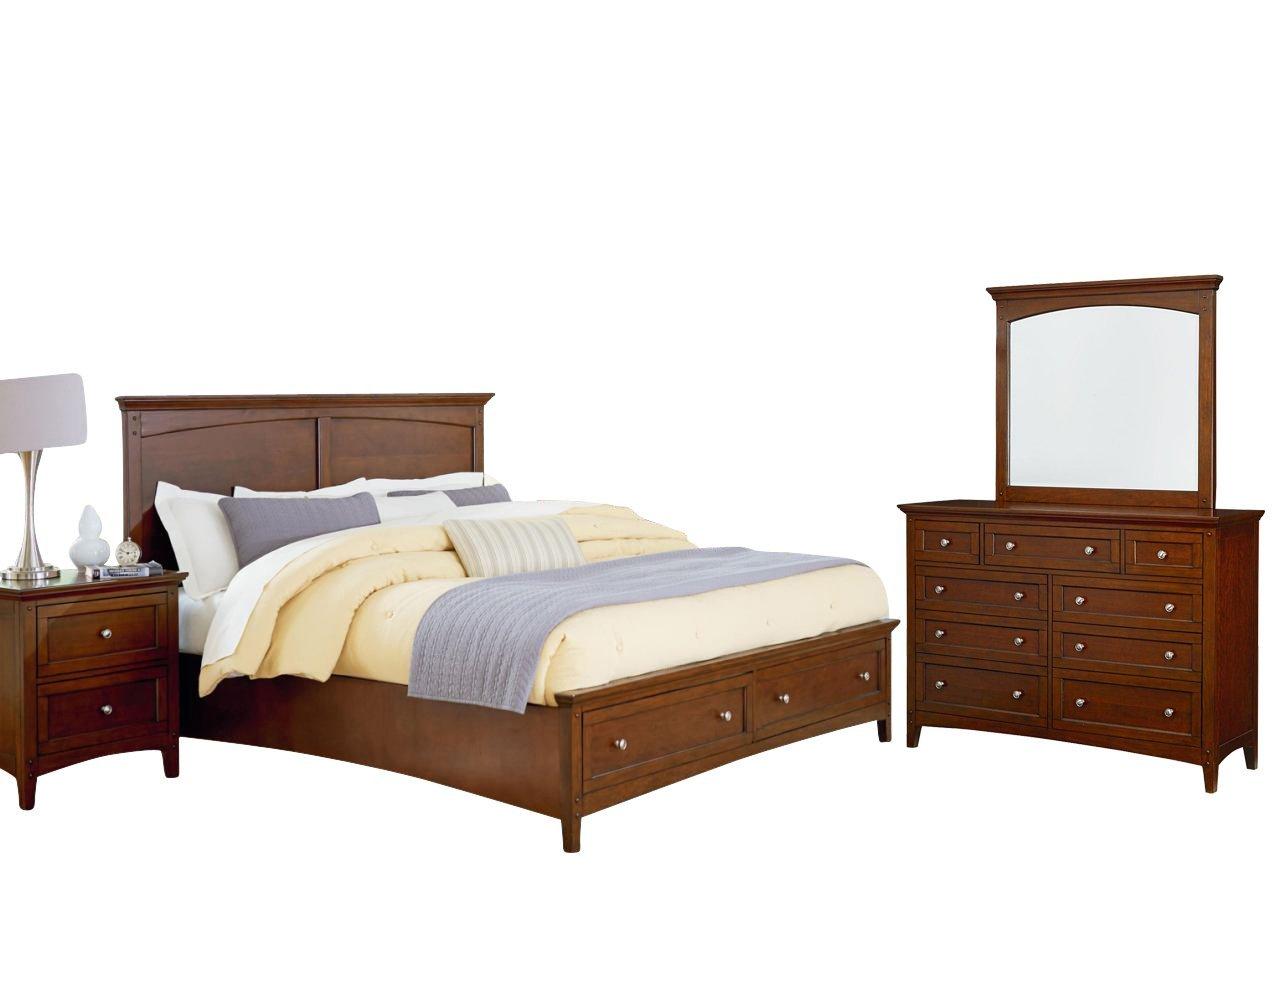 Standard Cooperstown Bedroom Set with Bed, Nightstand, Dresser and Mirror